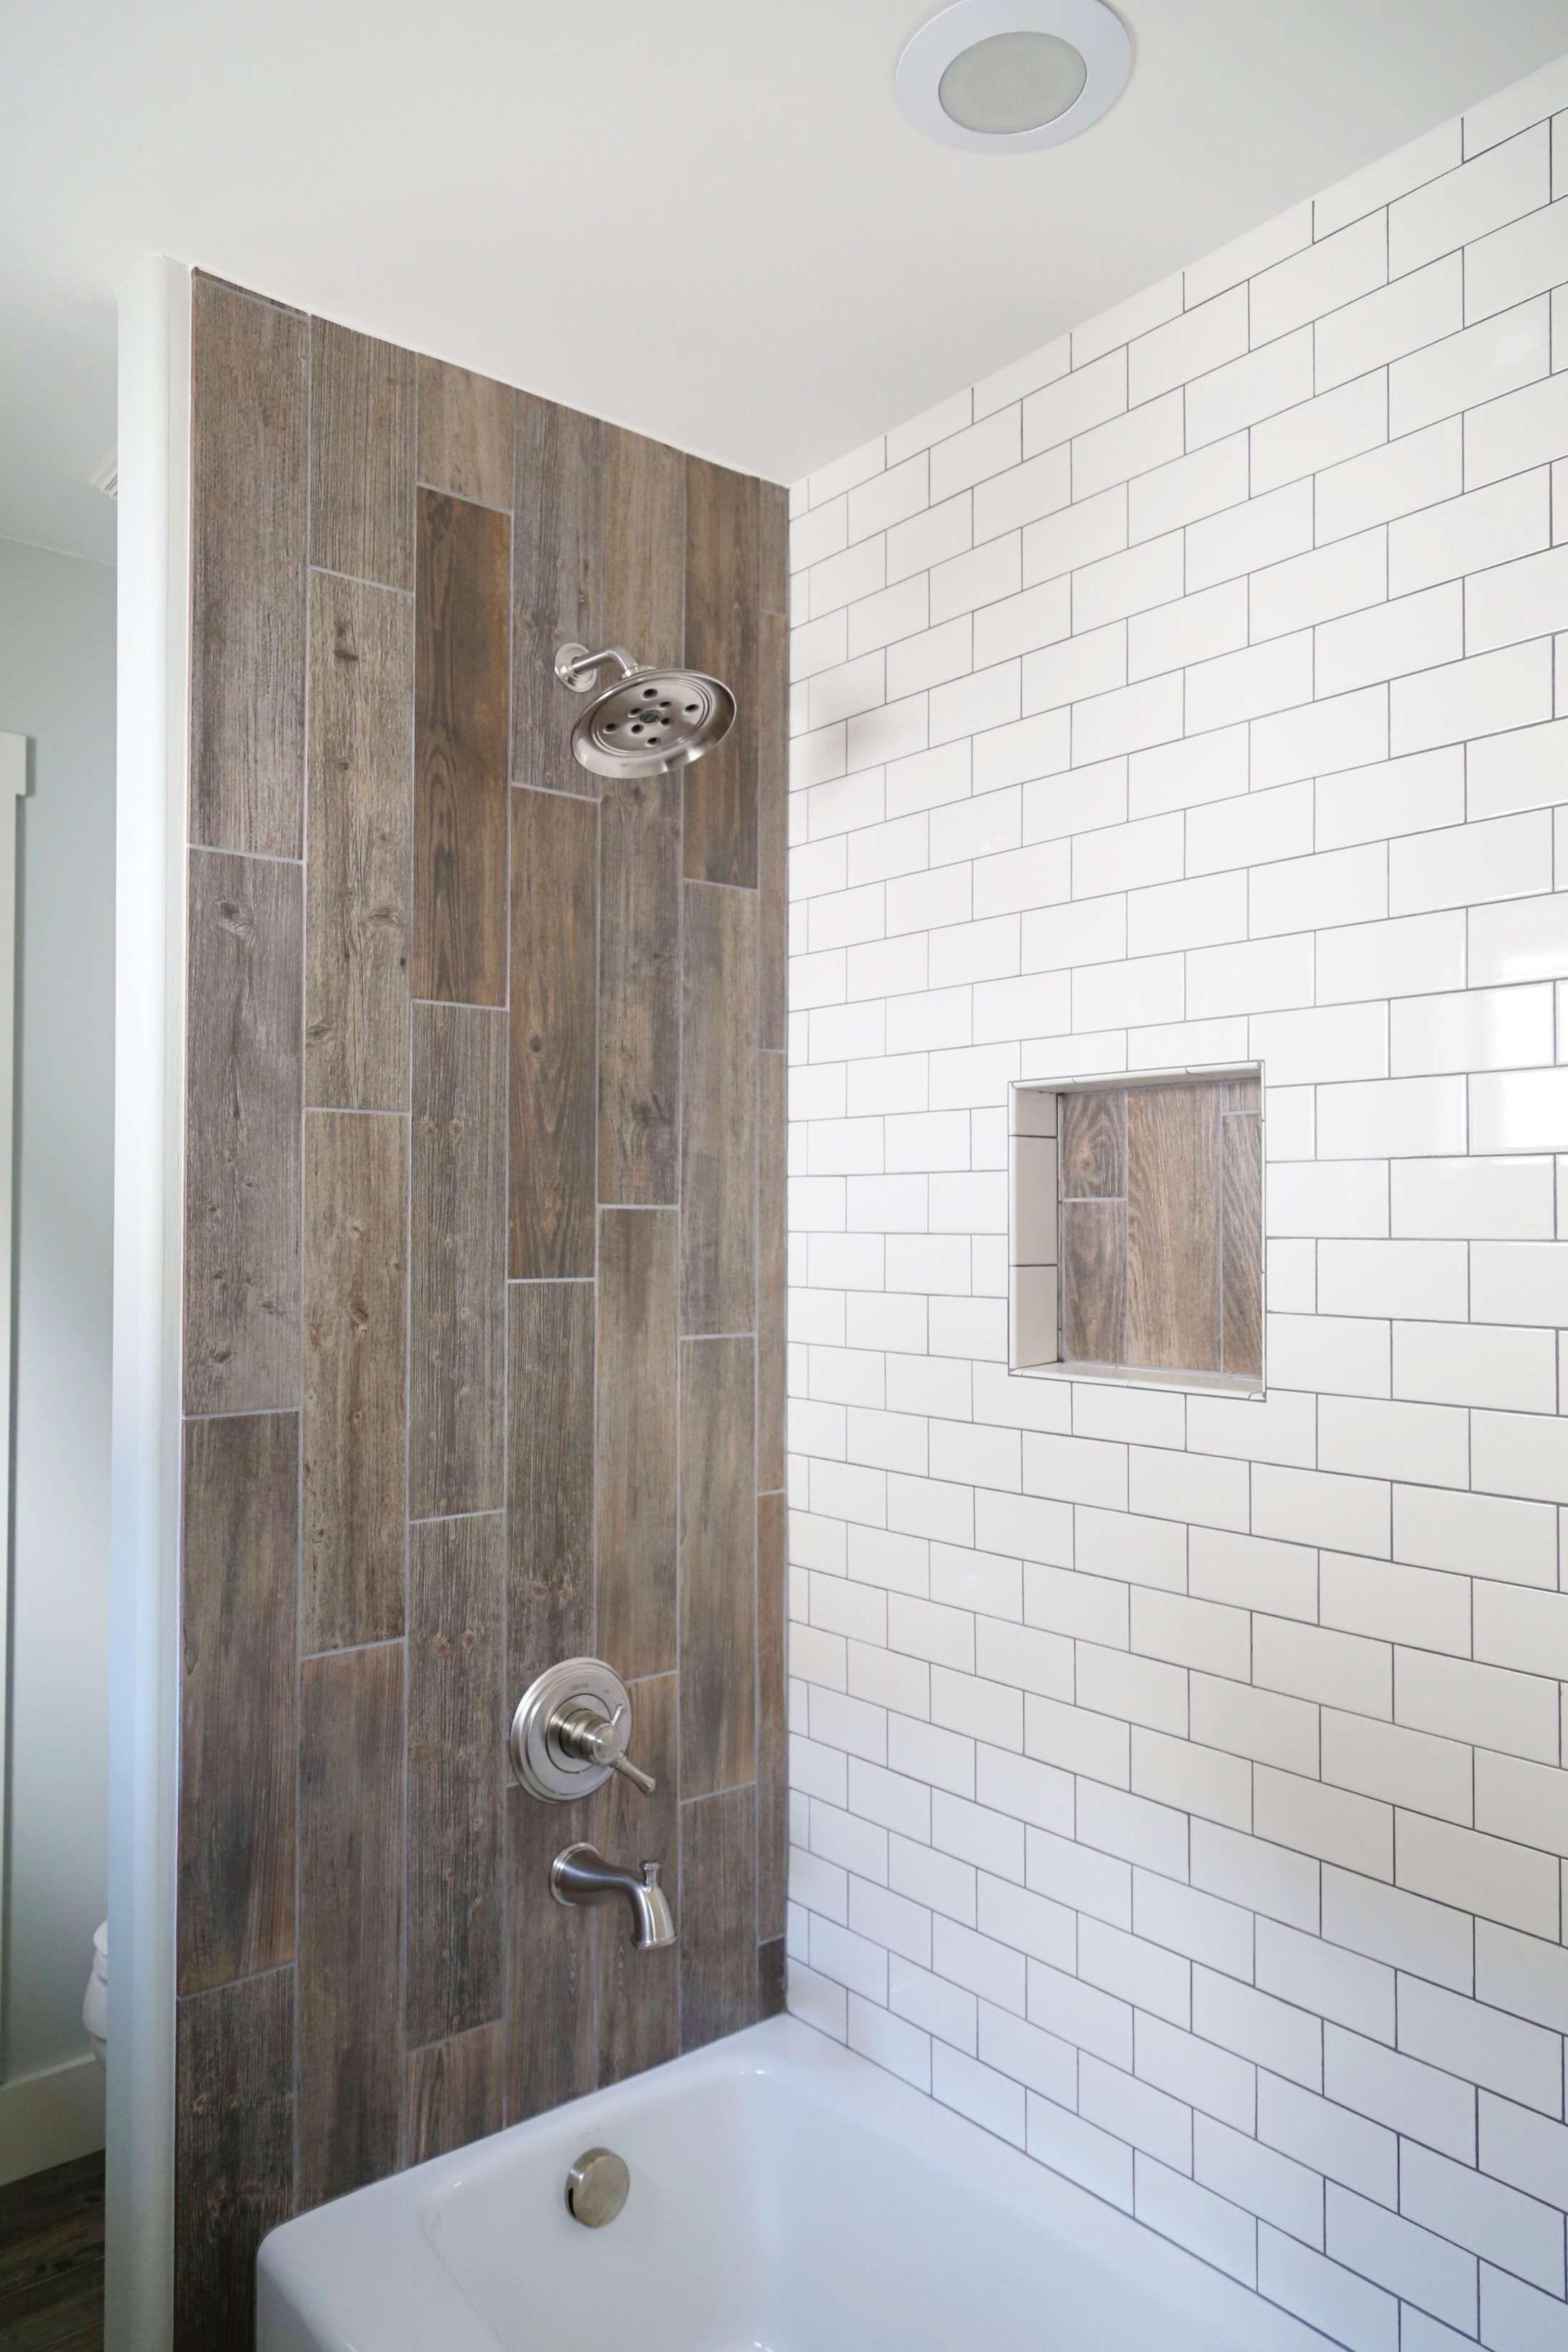 12 Gorgeous Wood Tile Bathroom Wall Gallery Wooden Wall Design Bathroom Shower Walls Farmhouse Bathroom Decor